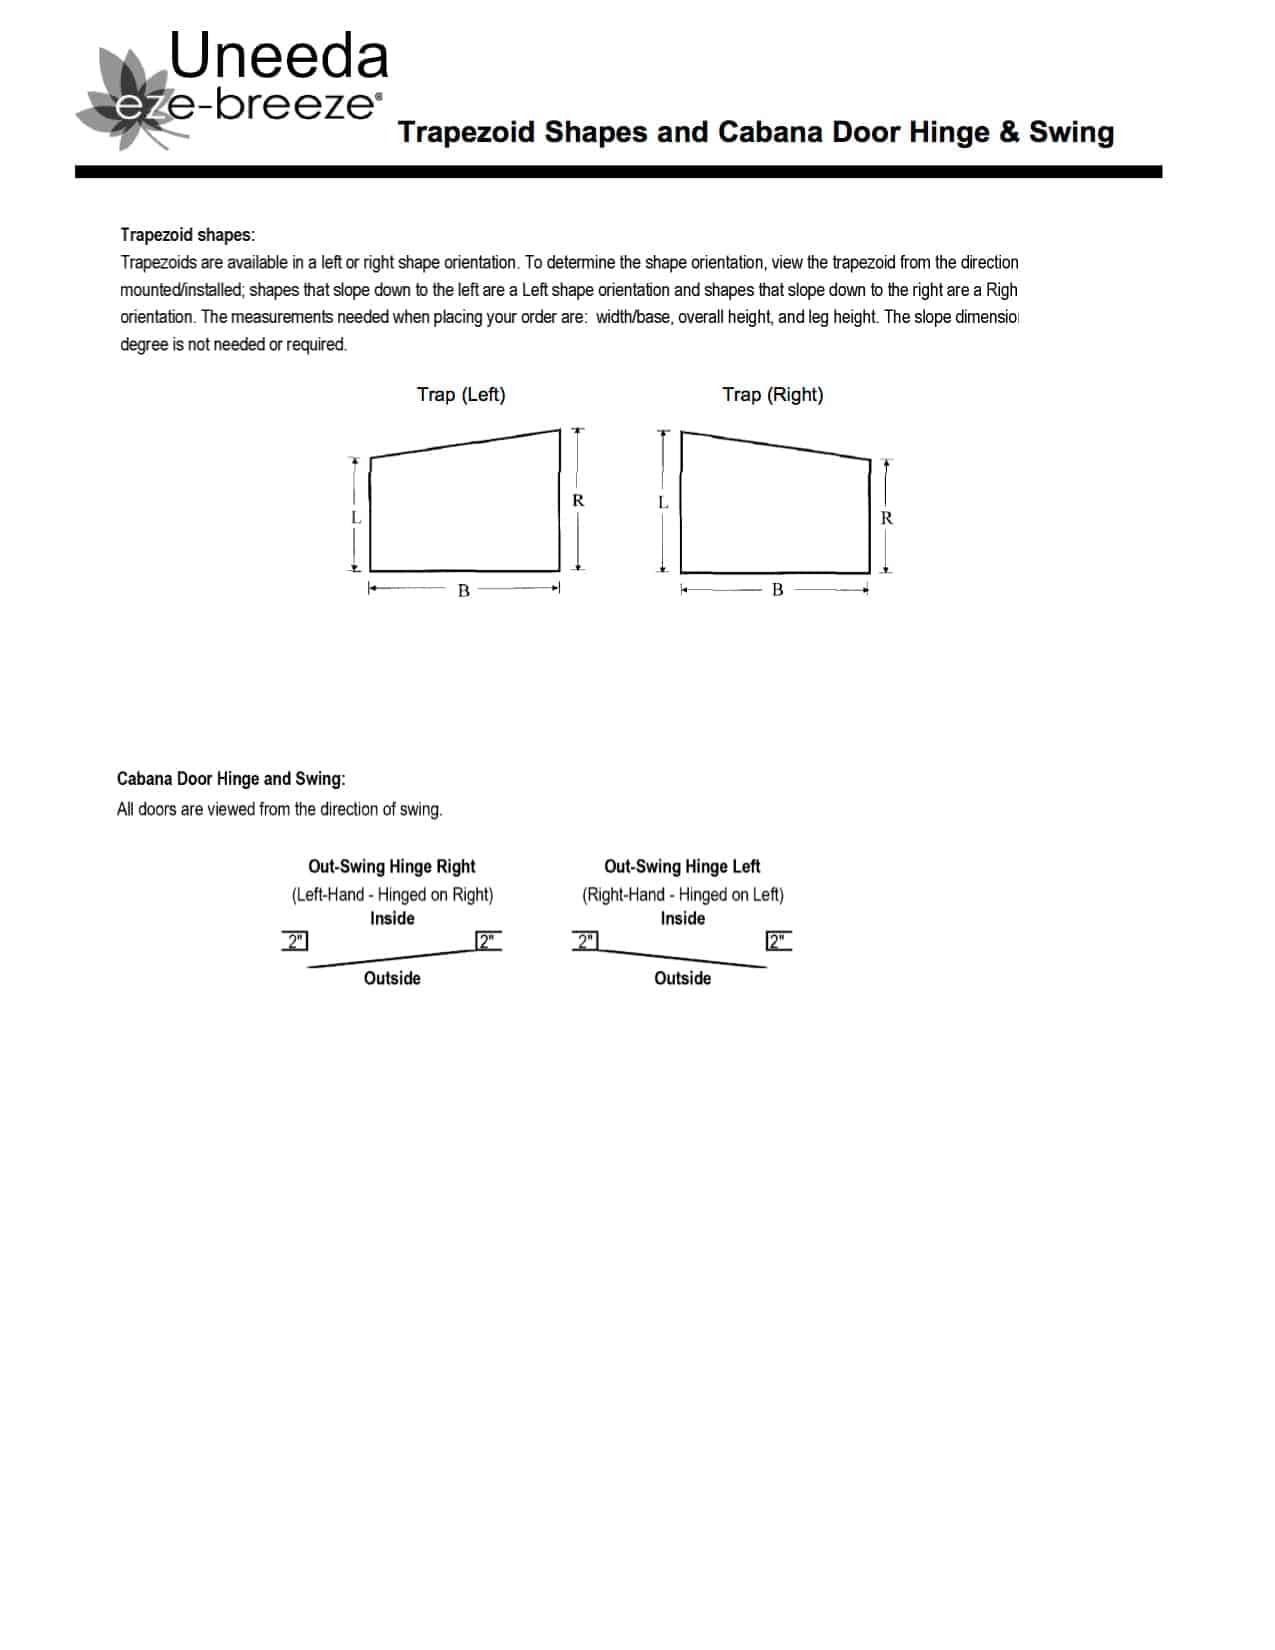 Trapezoid-Shapes-and-Cabana-Door-Hinge-Swing